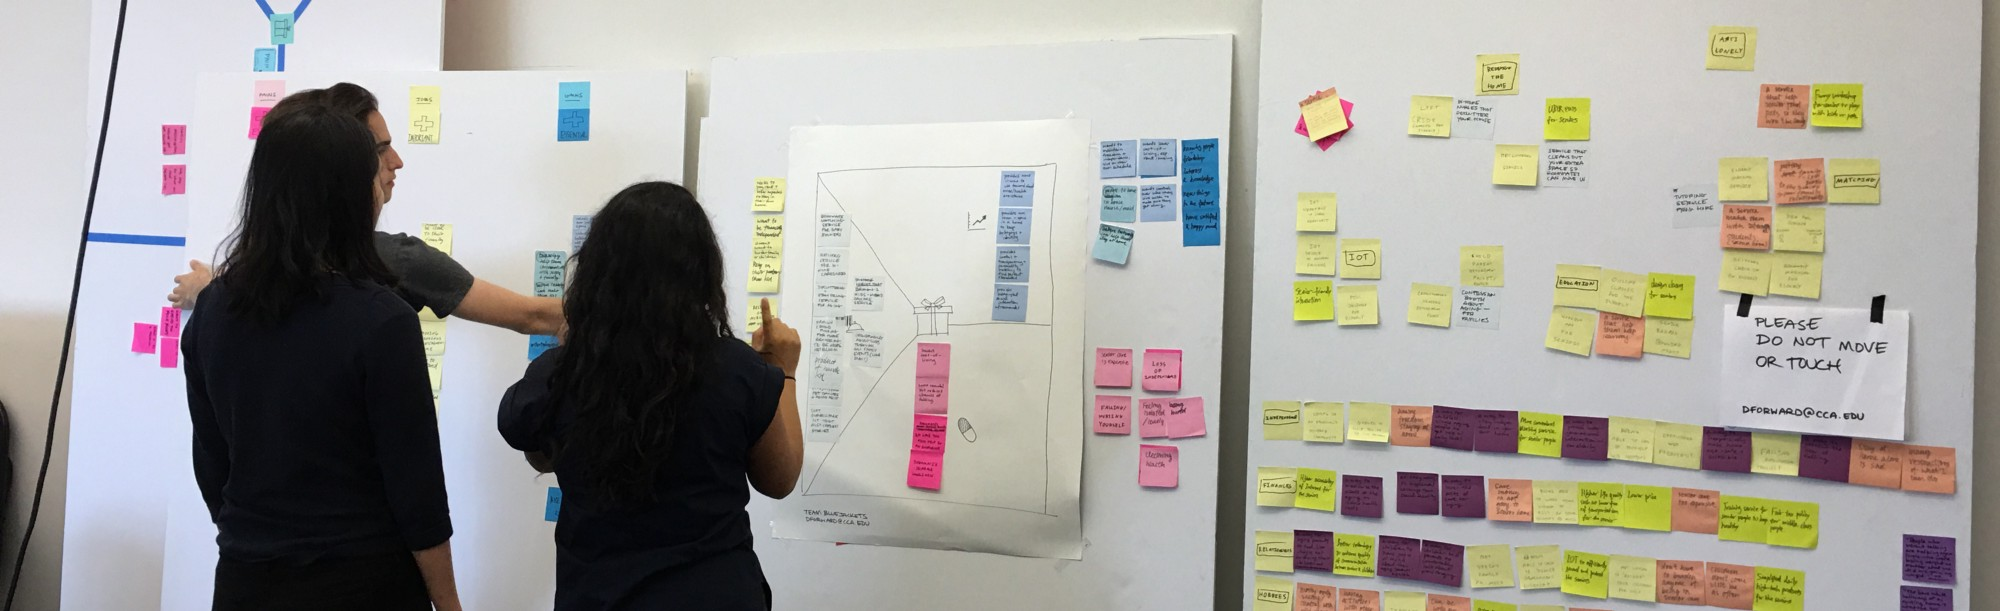 design thinking.jpeg